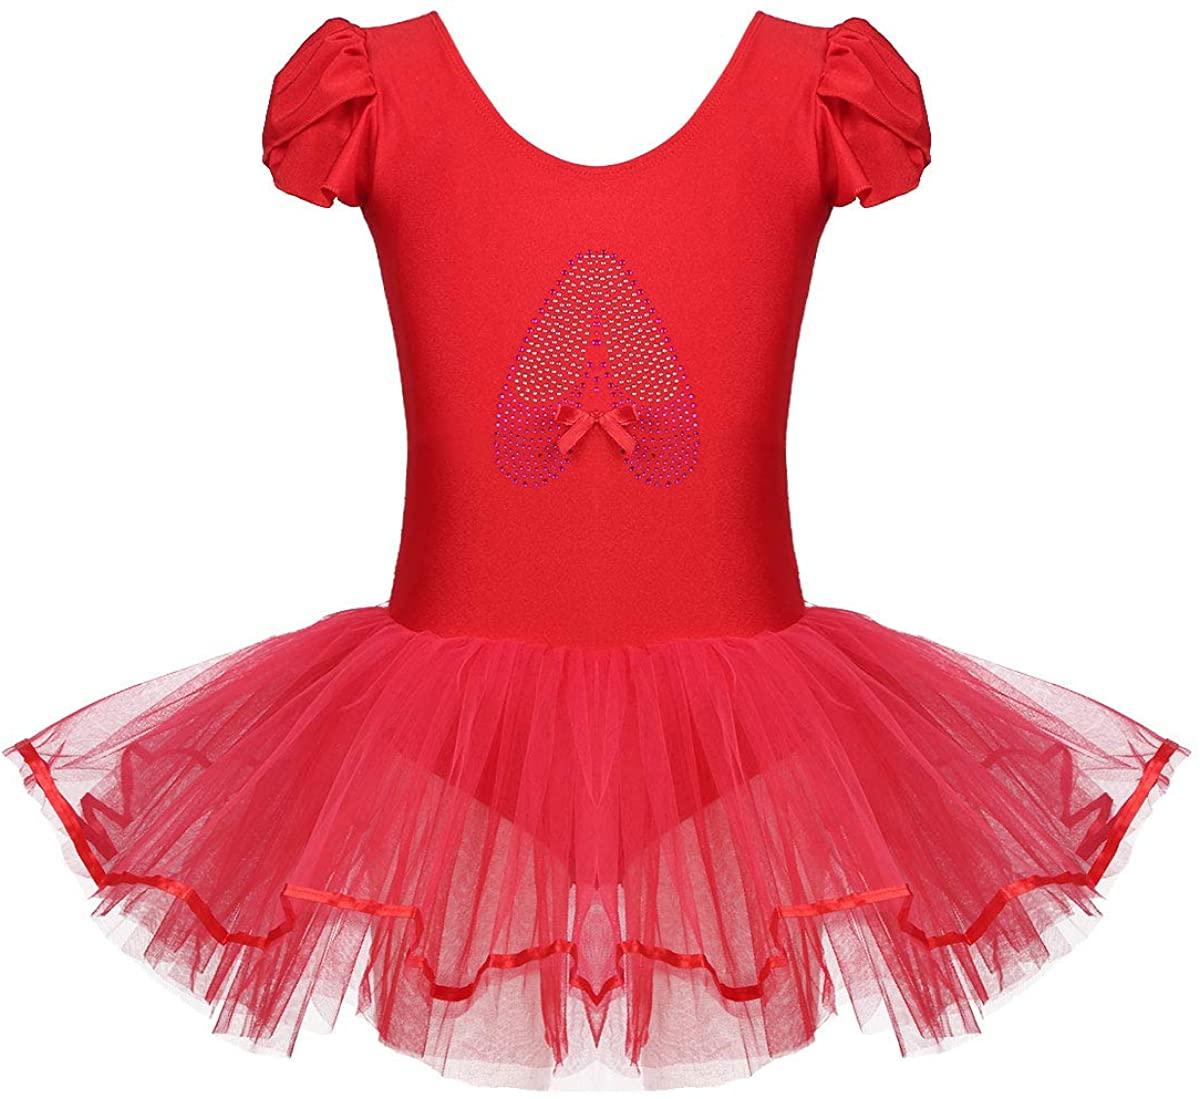 ACSUSS Kids Girls Ruffled Cap Sleeves Sequins Toes Print Ballet Tutu Dress Leotard Ballerina Athletic Dance Dress